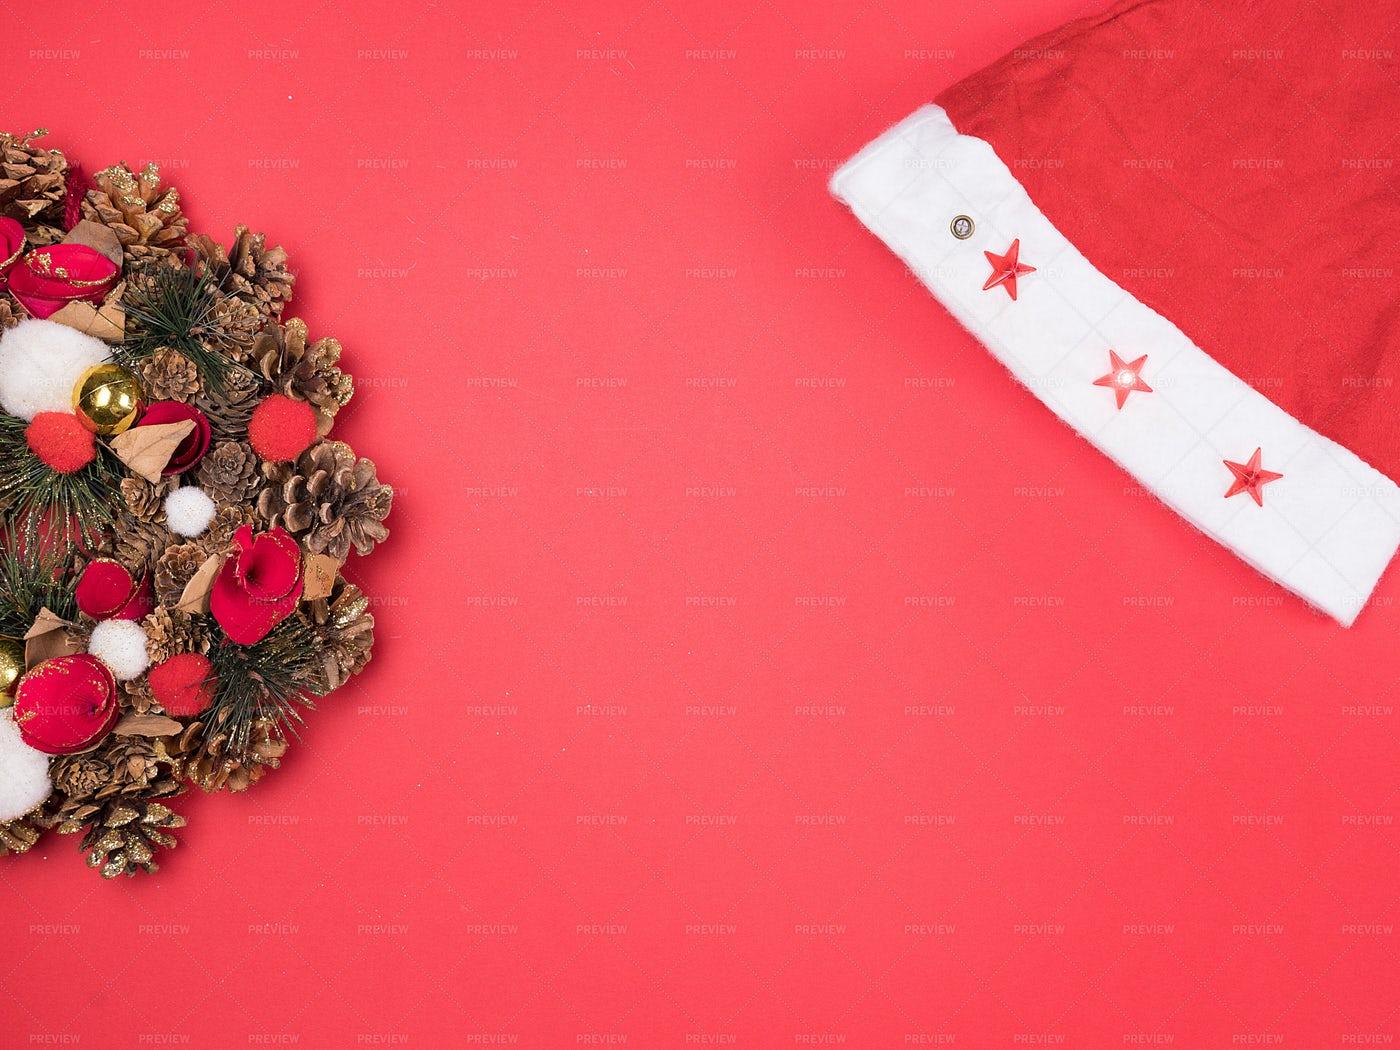 Santa Hat And Wreath: Stock Photos